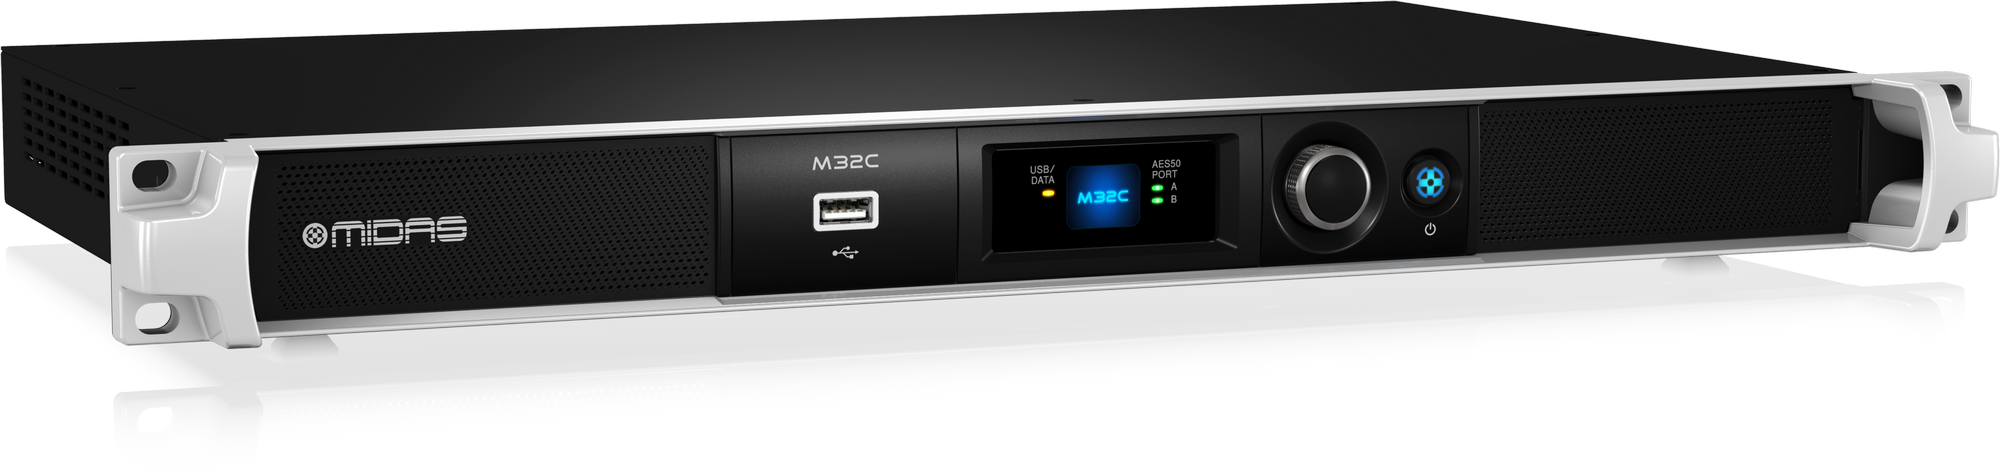 Midas M32C Midas M32C Digital 1HE-Rackmixer multifunktional